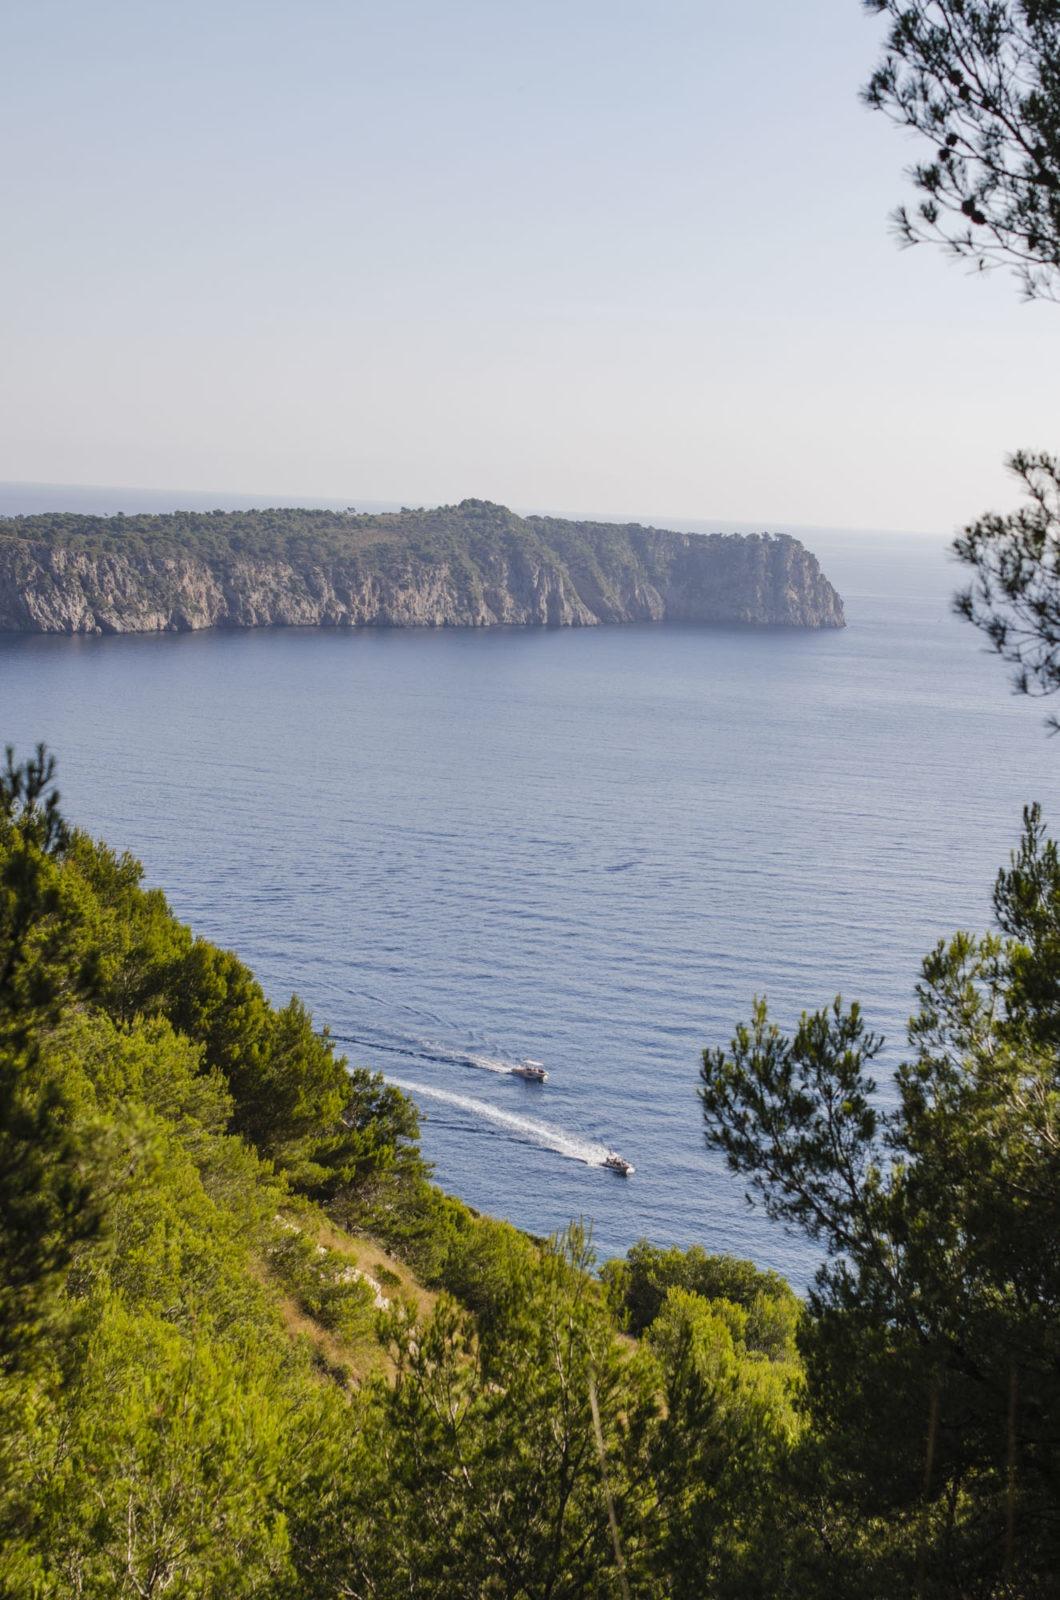 Mallorca - Yolo Journal